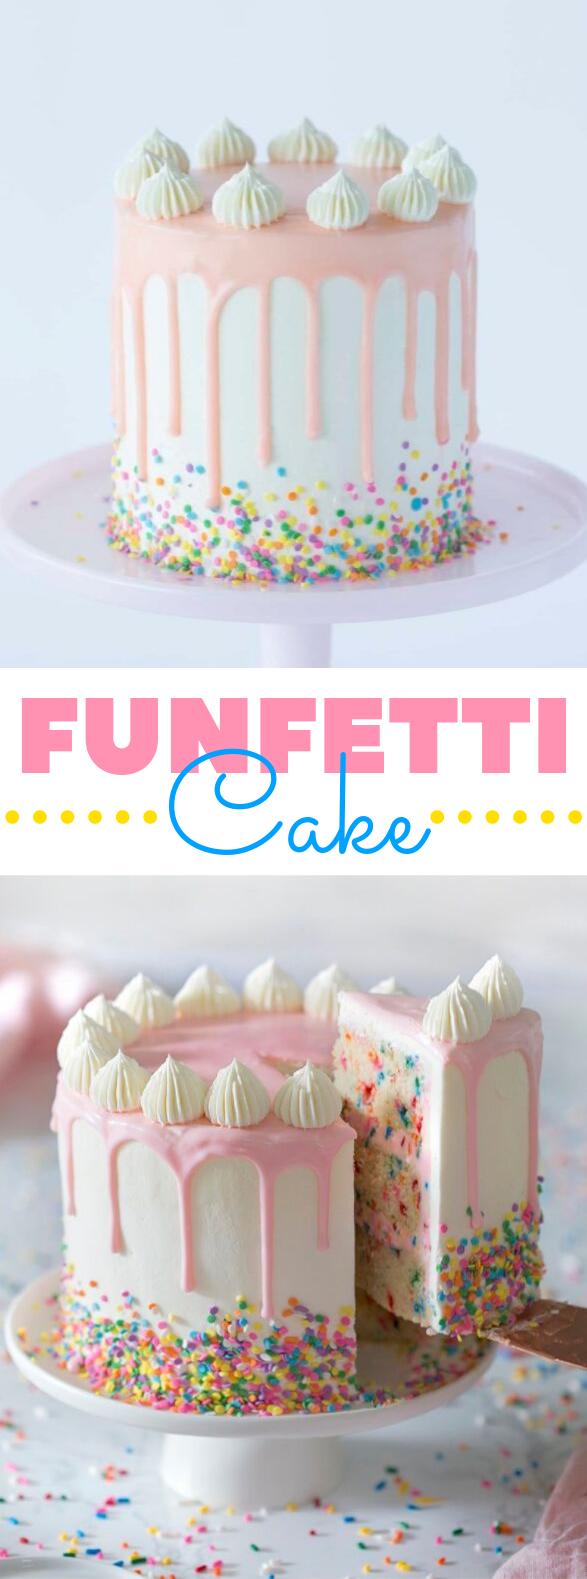 Funfetti Cake #desserts #birthdaycake